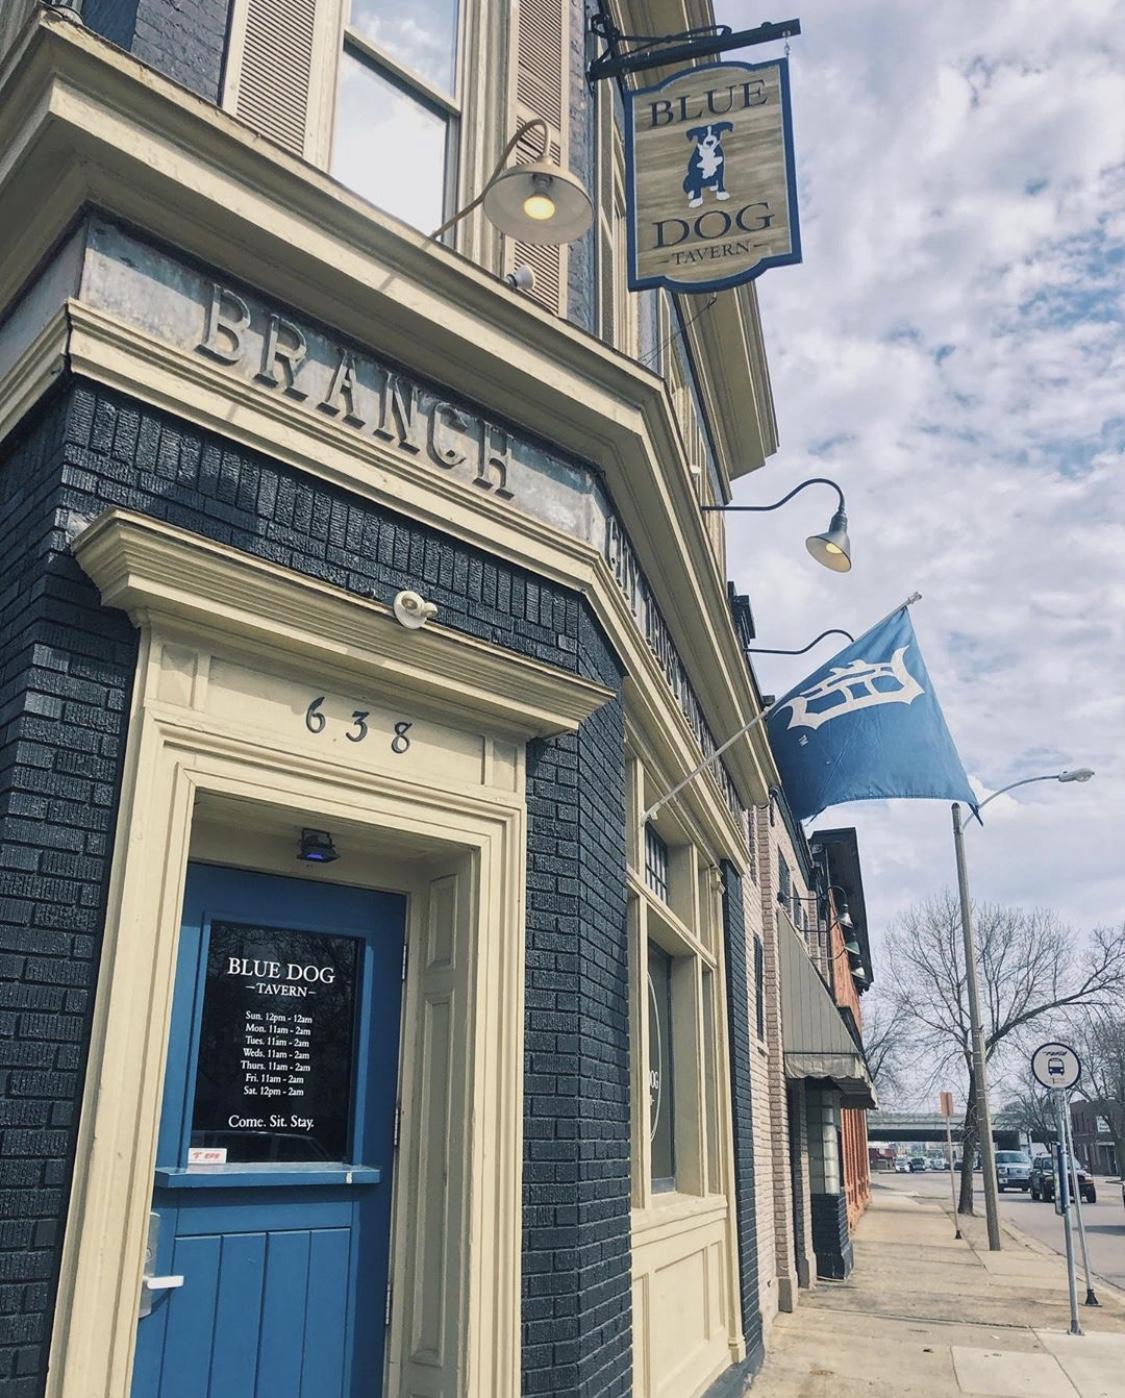 blue dog tavern west grand rapids michigan iheartgr iheartgrandrapids